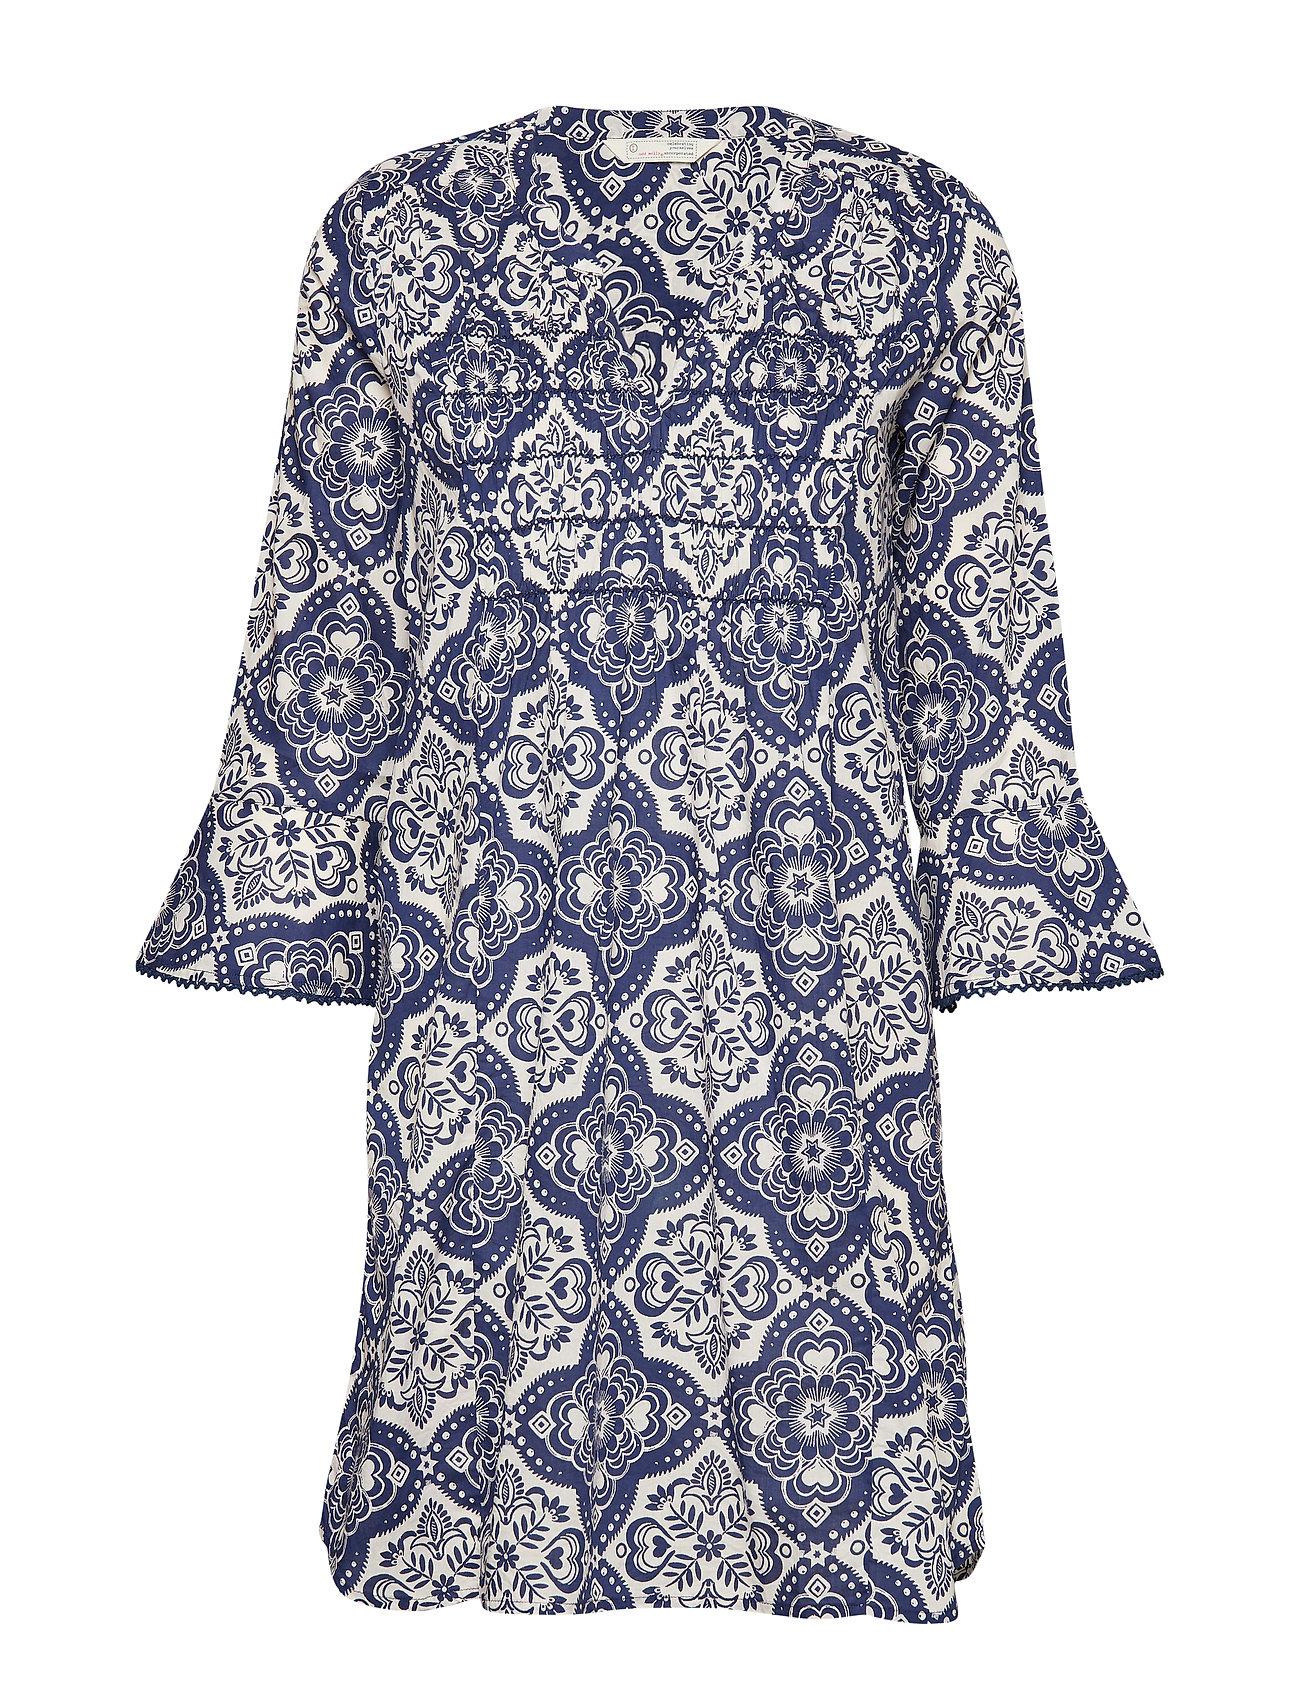 ODD MOLLY no limit dress - NIGHTFALL BLUE